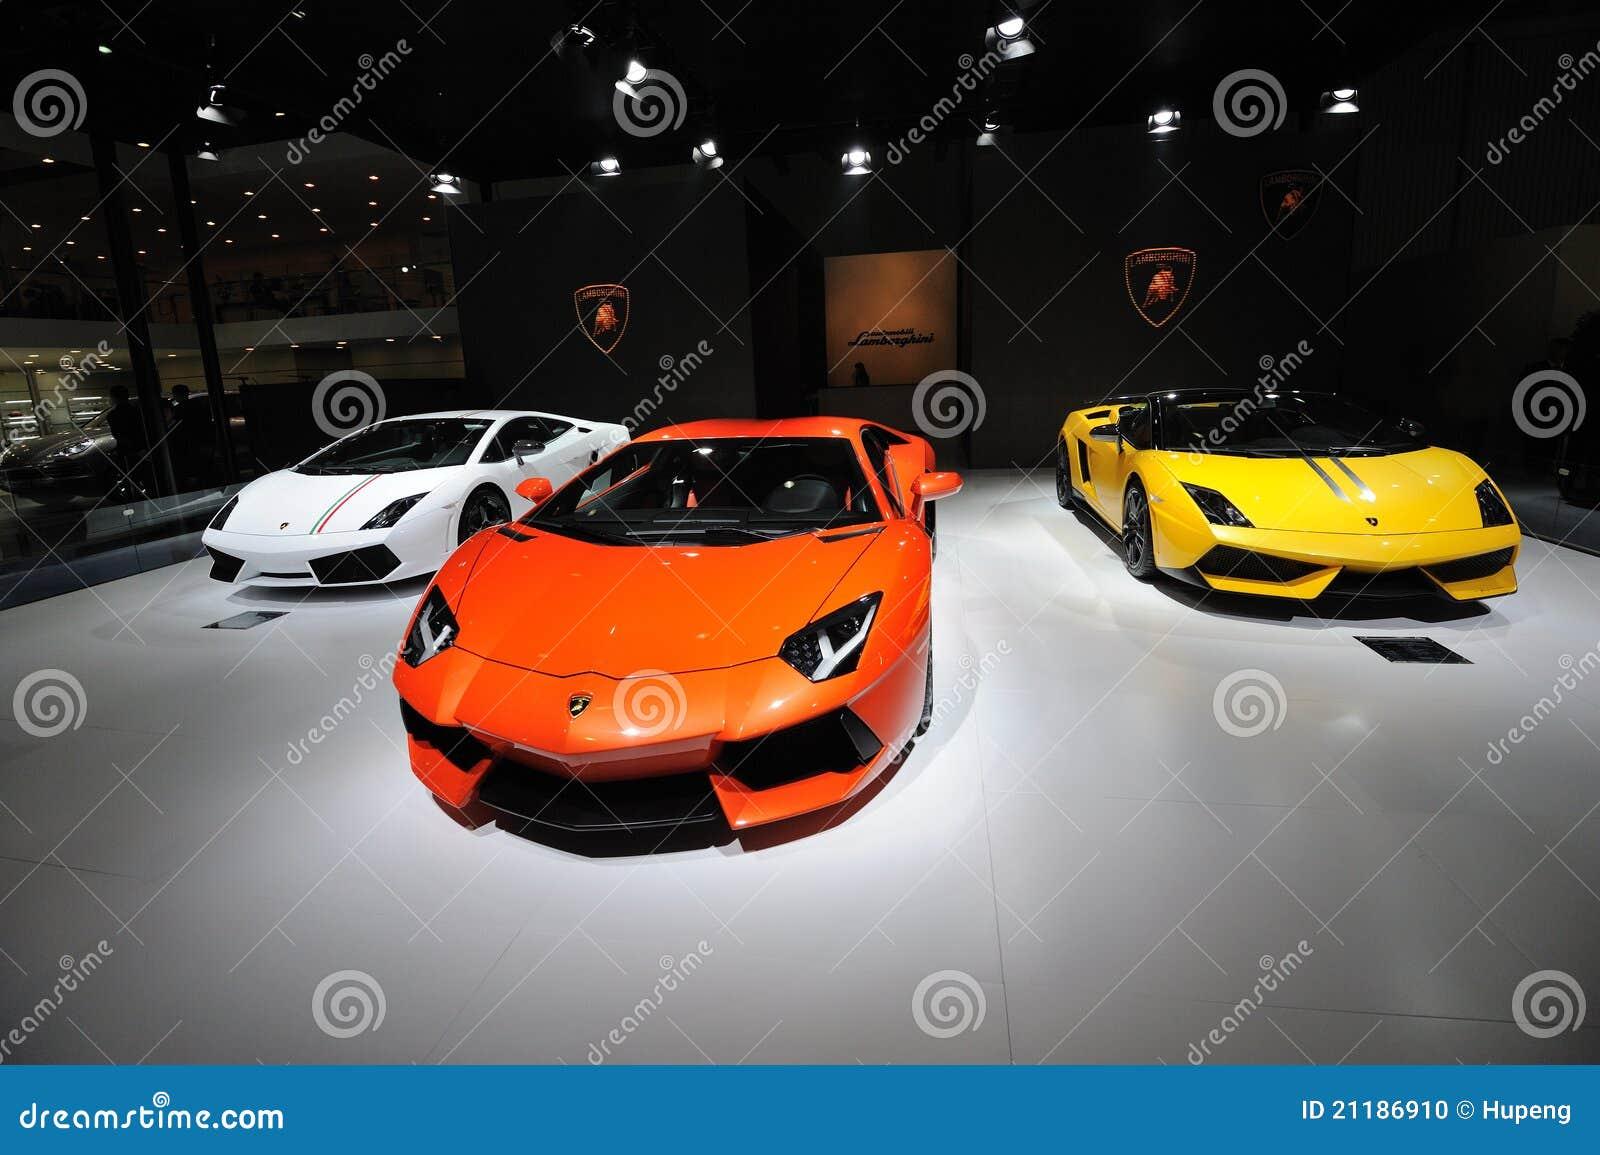 Italy Lamborghini pavilion